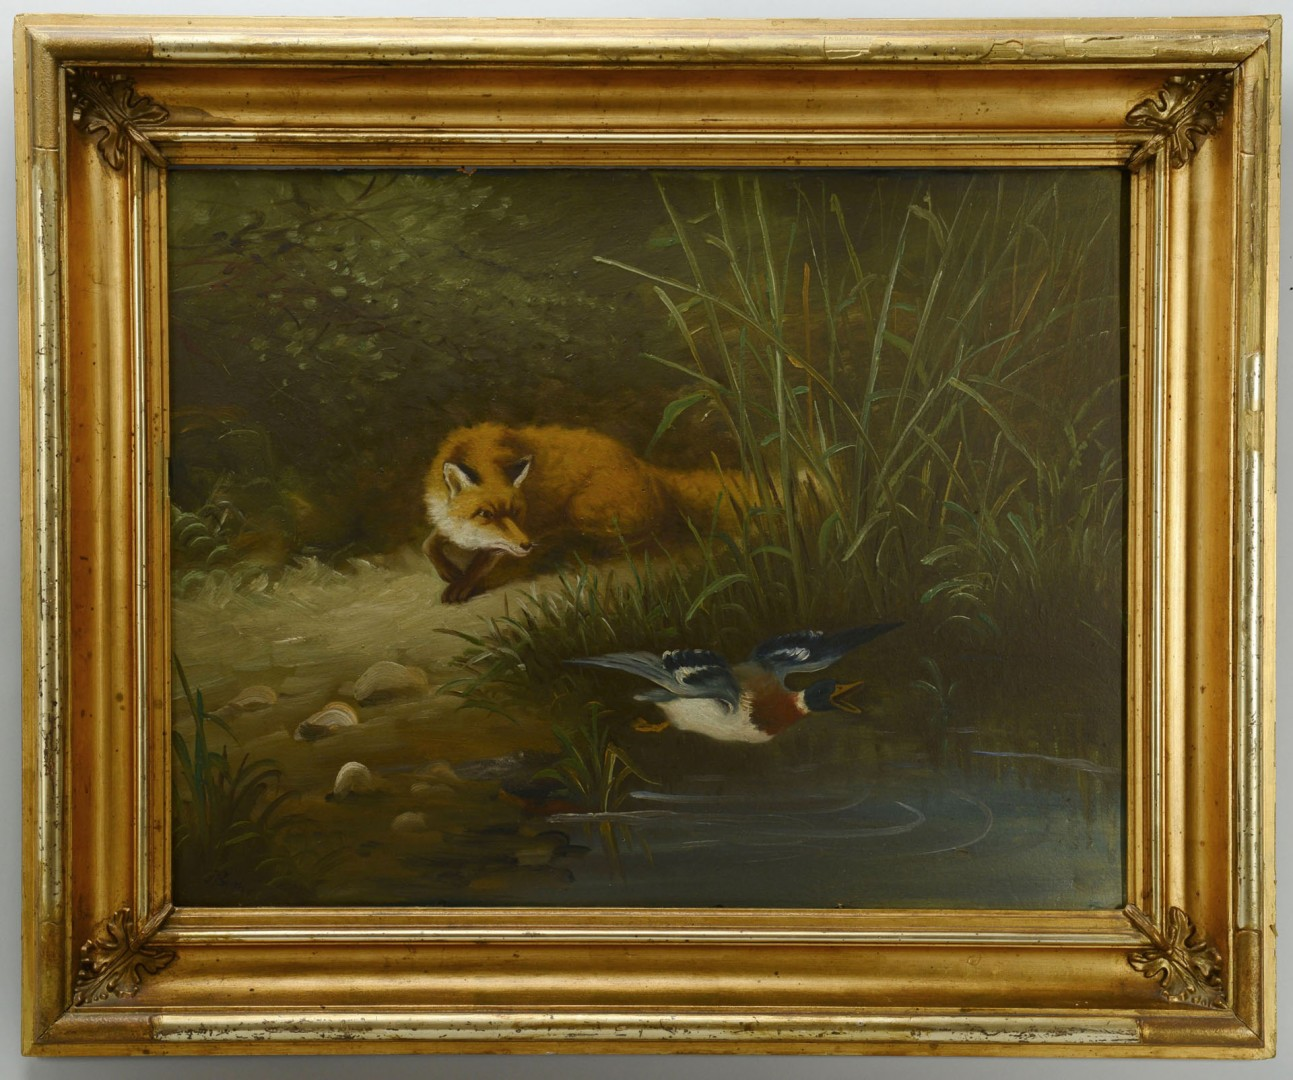 Oil on board, Fox preying on mallard duck